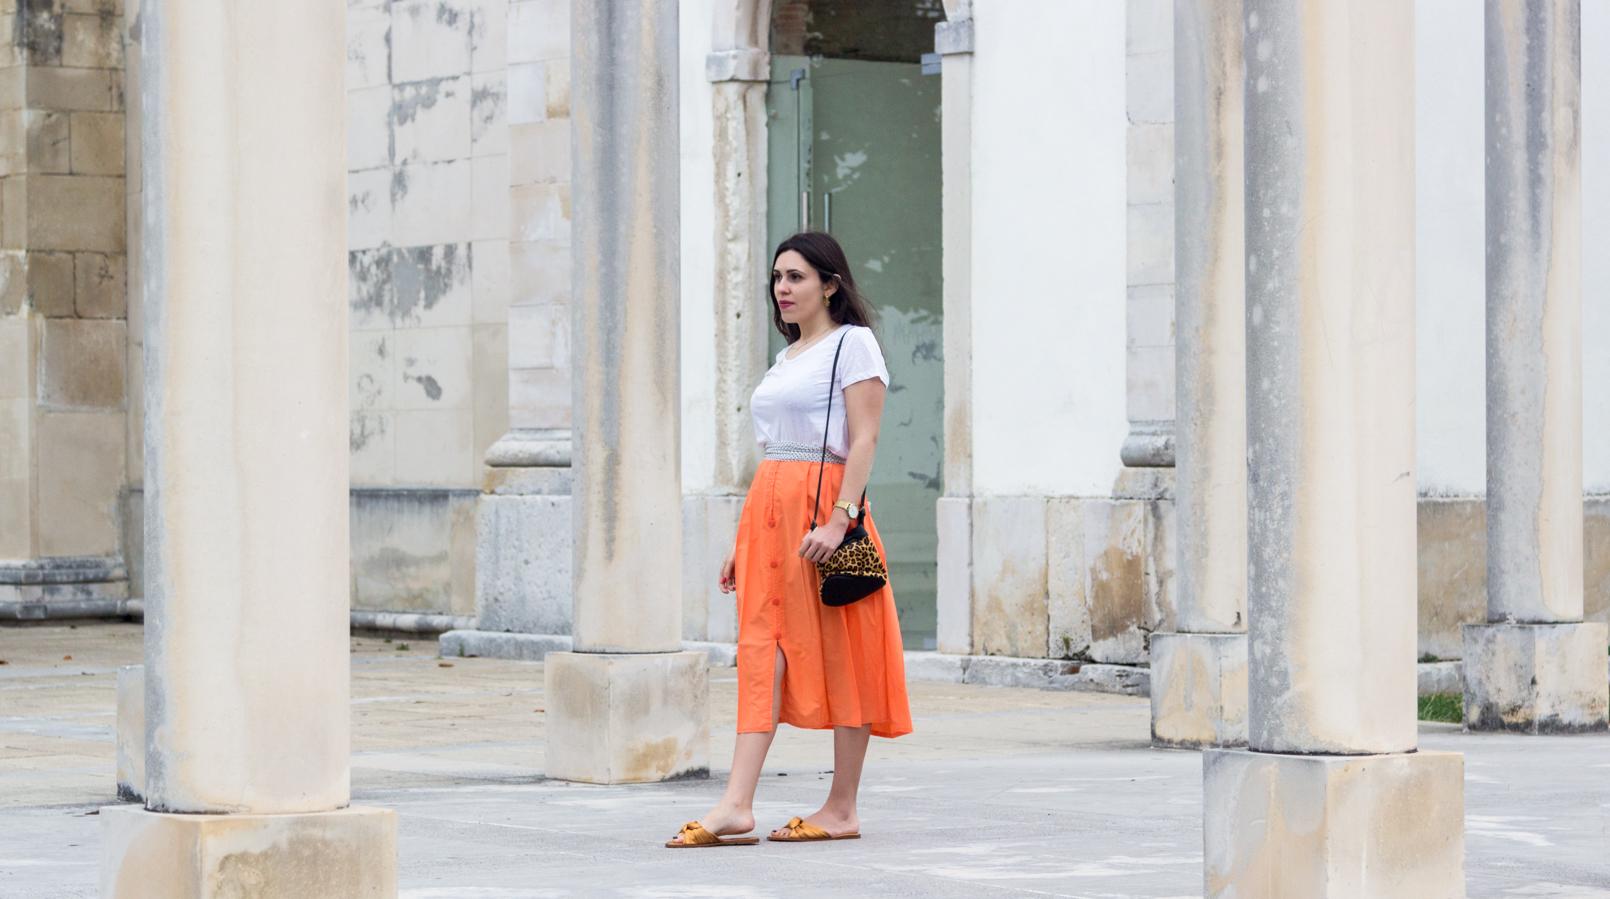 Le Fashionaire Onde comprar roupa vintage? tee branca algodao organico mango saia laranja midi botoes vintage chinelos amarelos laco cetim zara 4706F PT